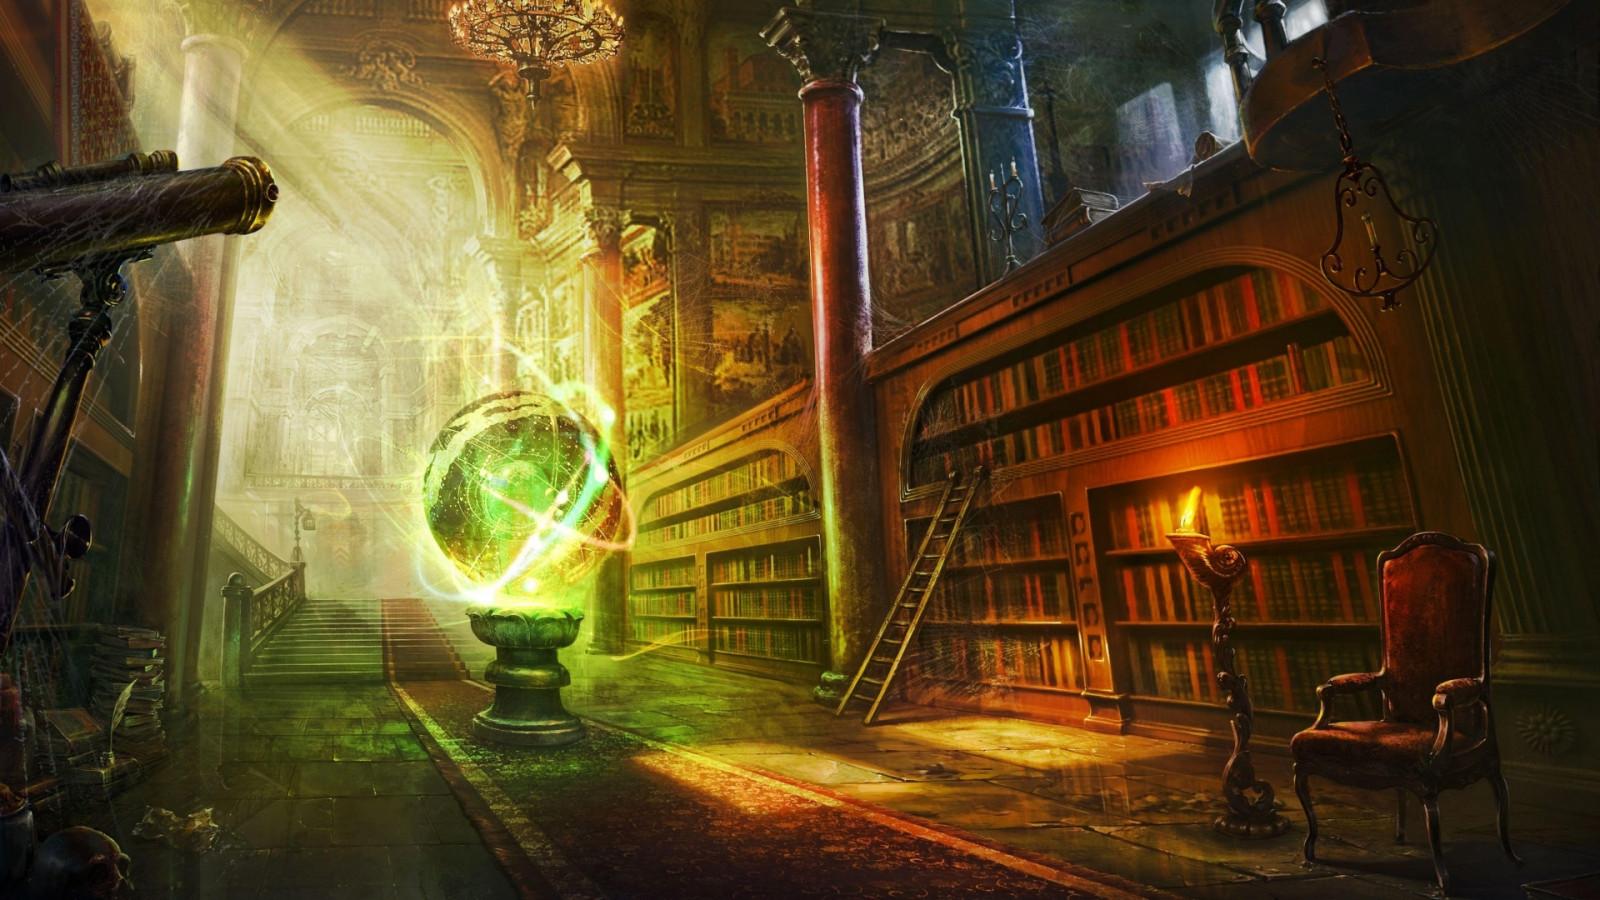 magic castle fantasy art library ball stairs column